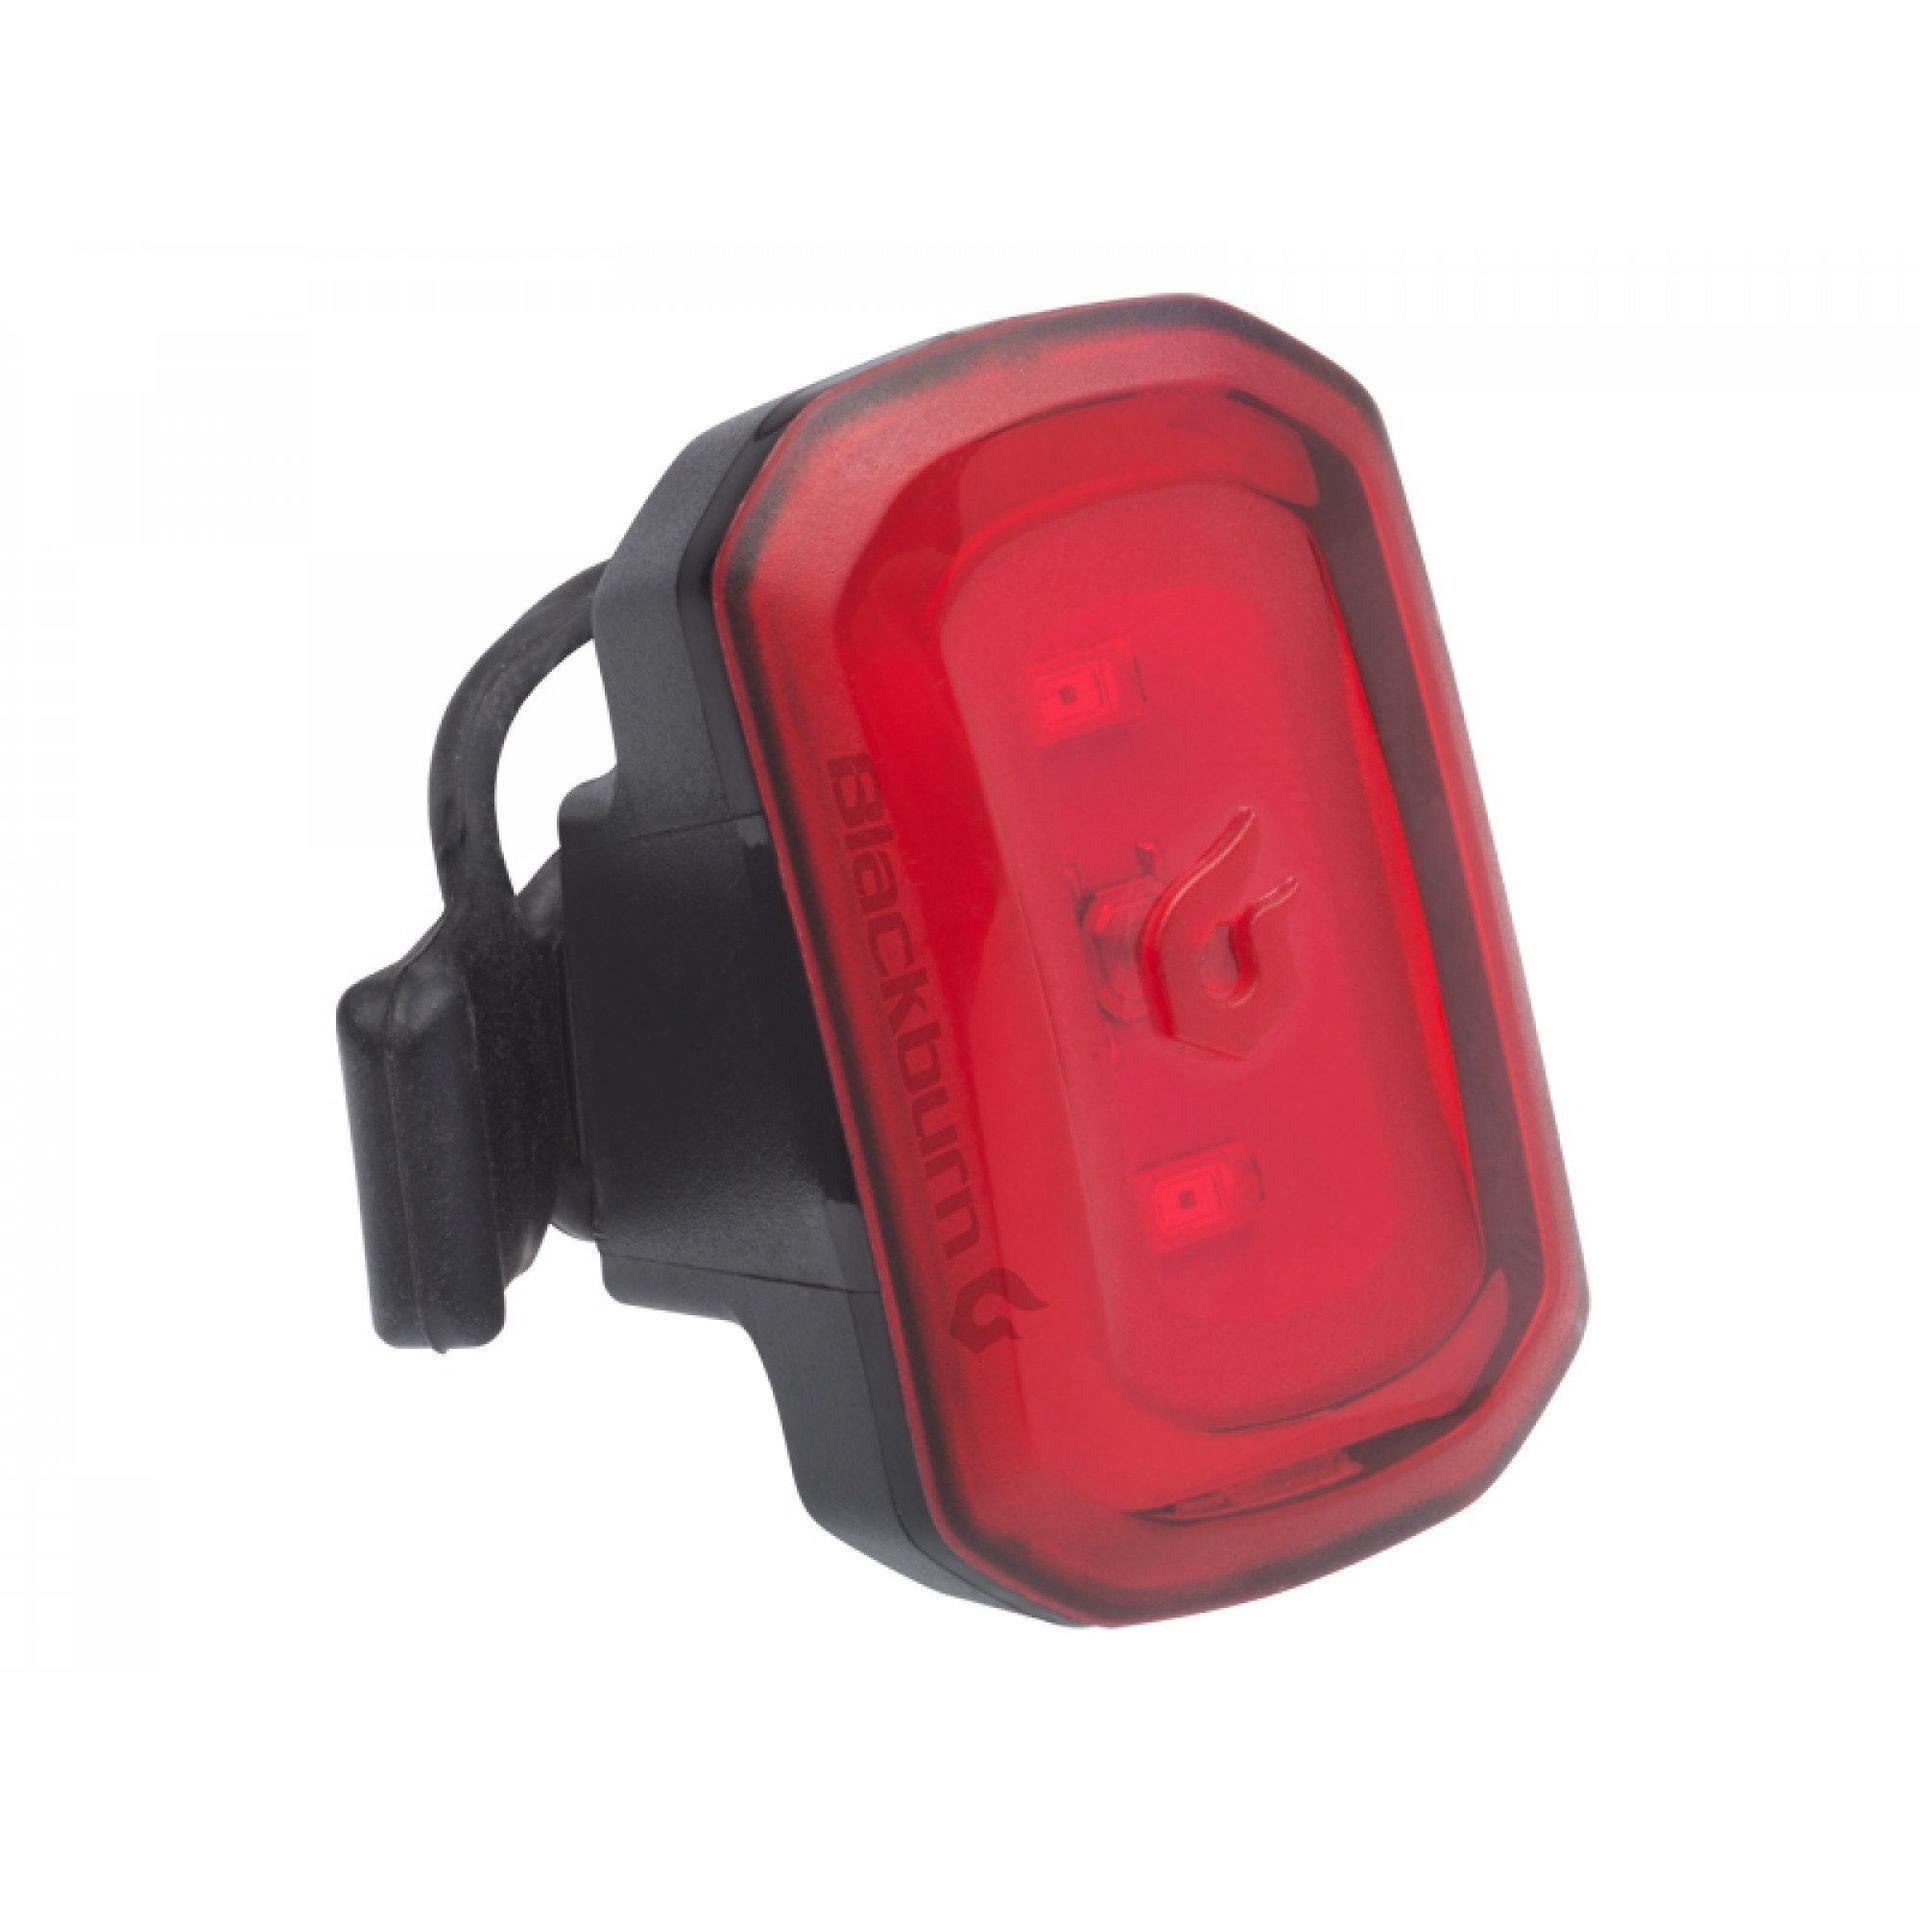 LAMPKA ROWEROWA TYLNA BLACKBURN CLICK USB CZARNY 1